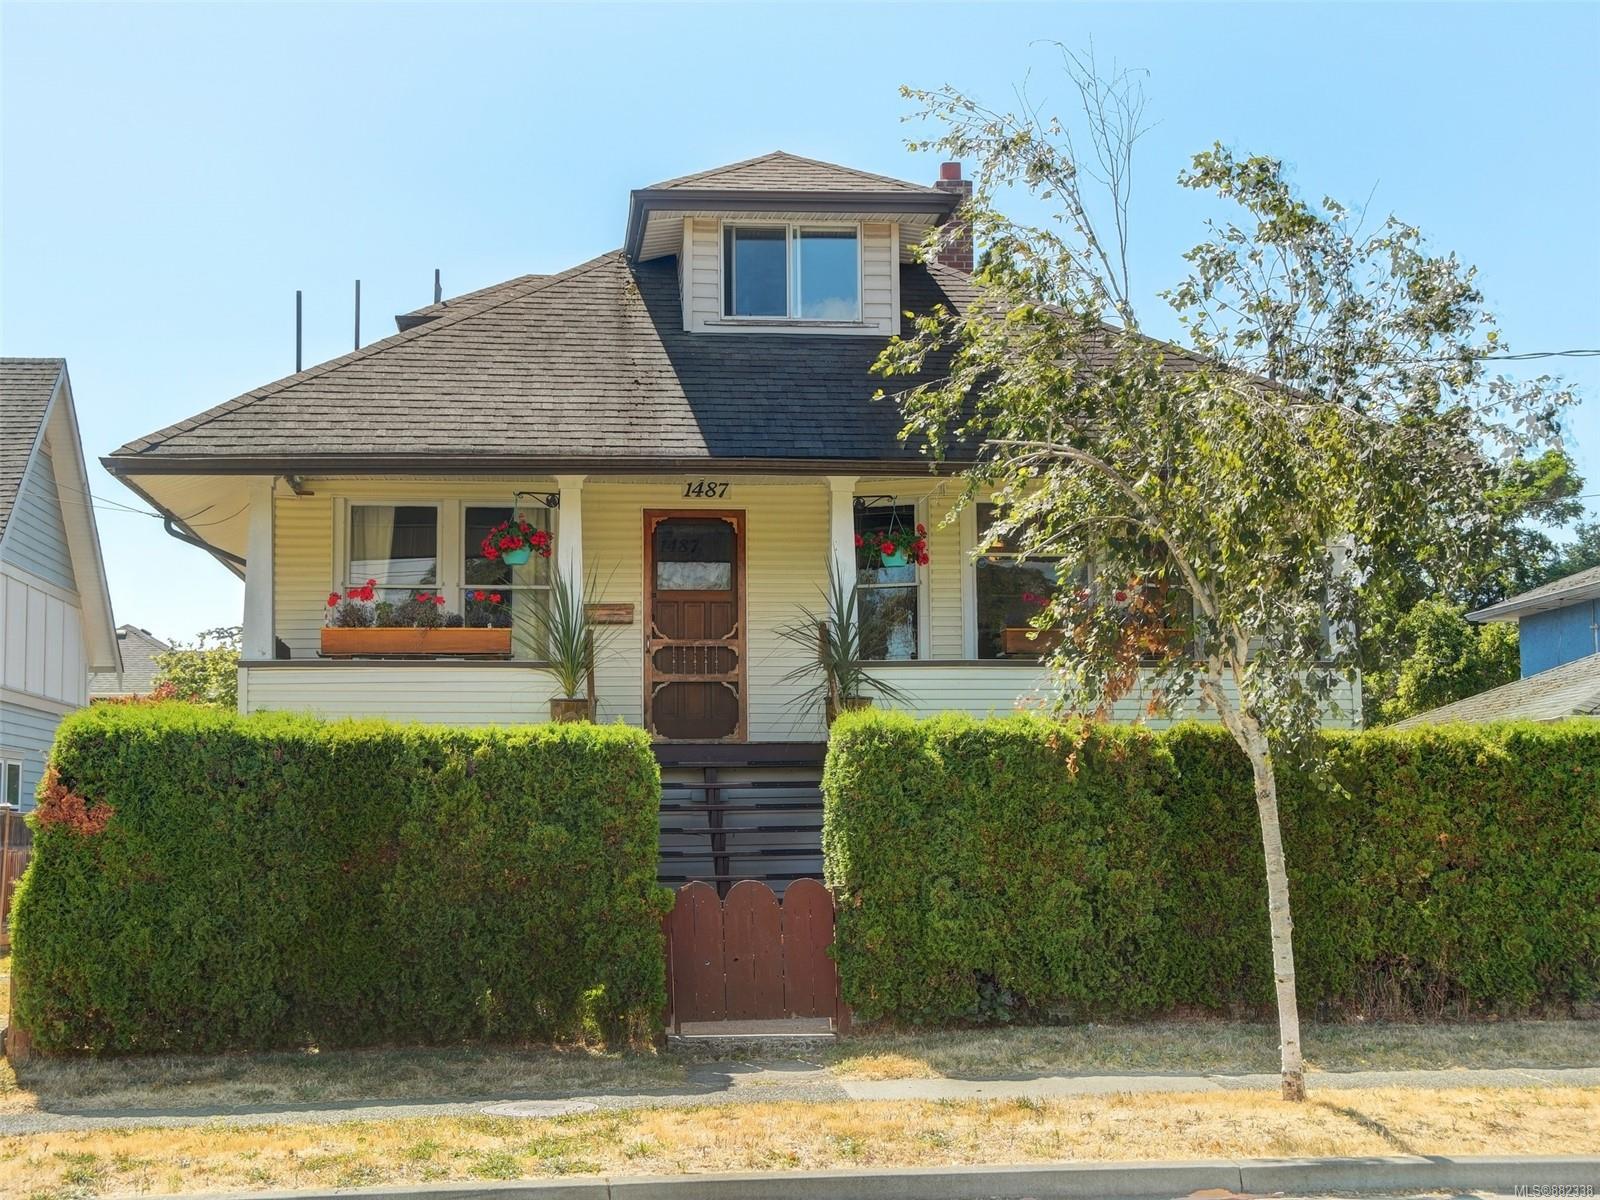 1487 Myrtle Avenue, Oaklands, Victoria photo number 2